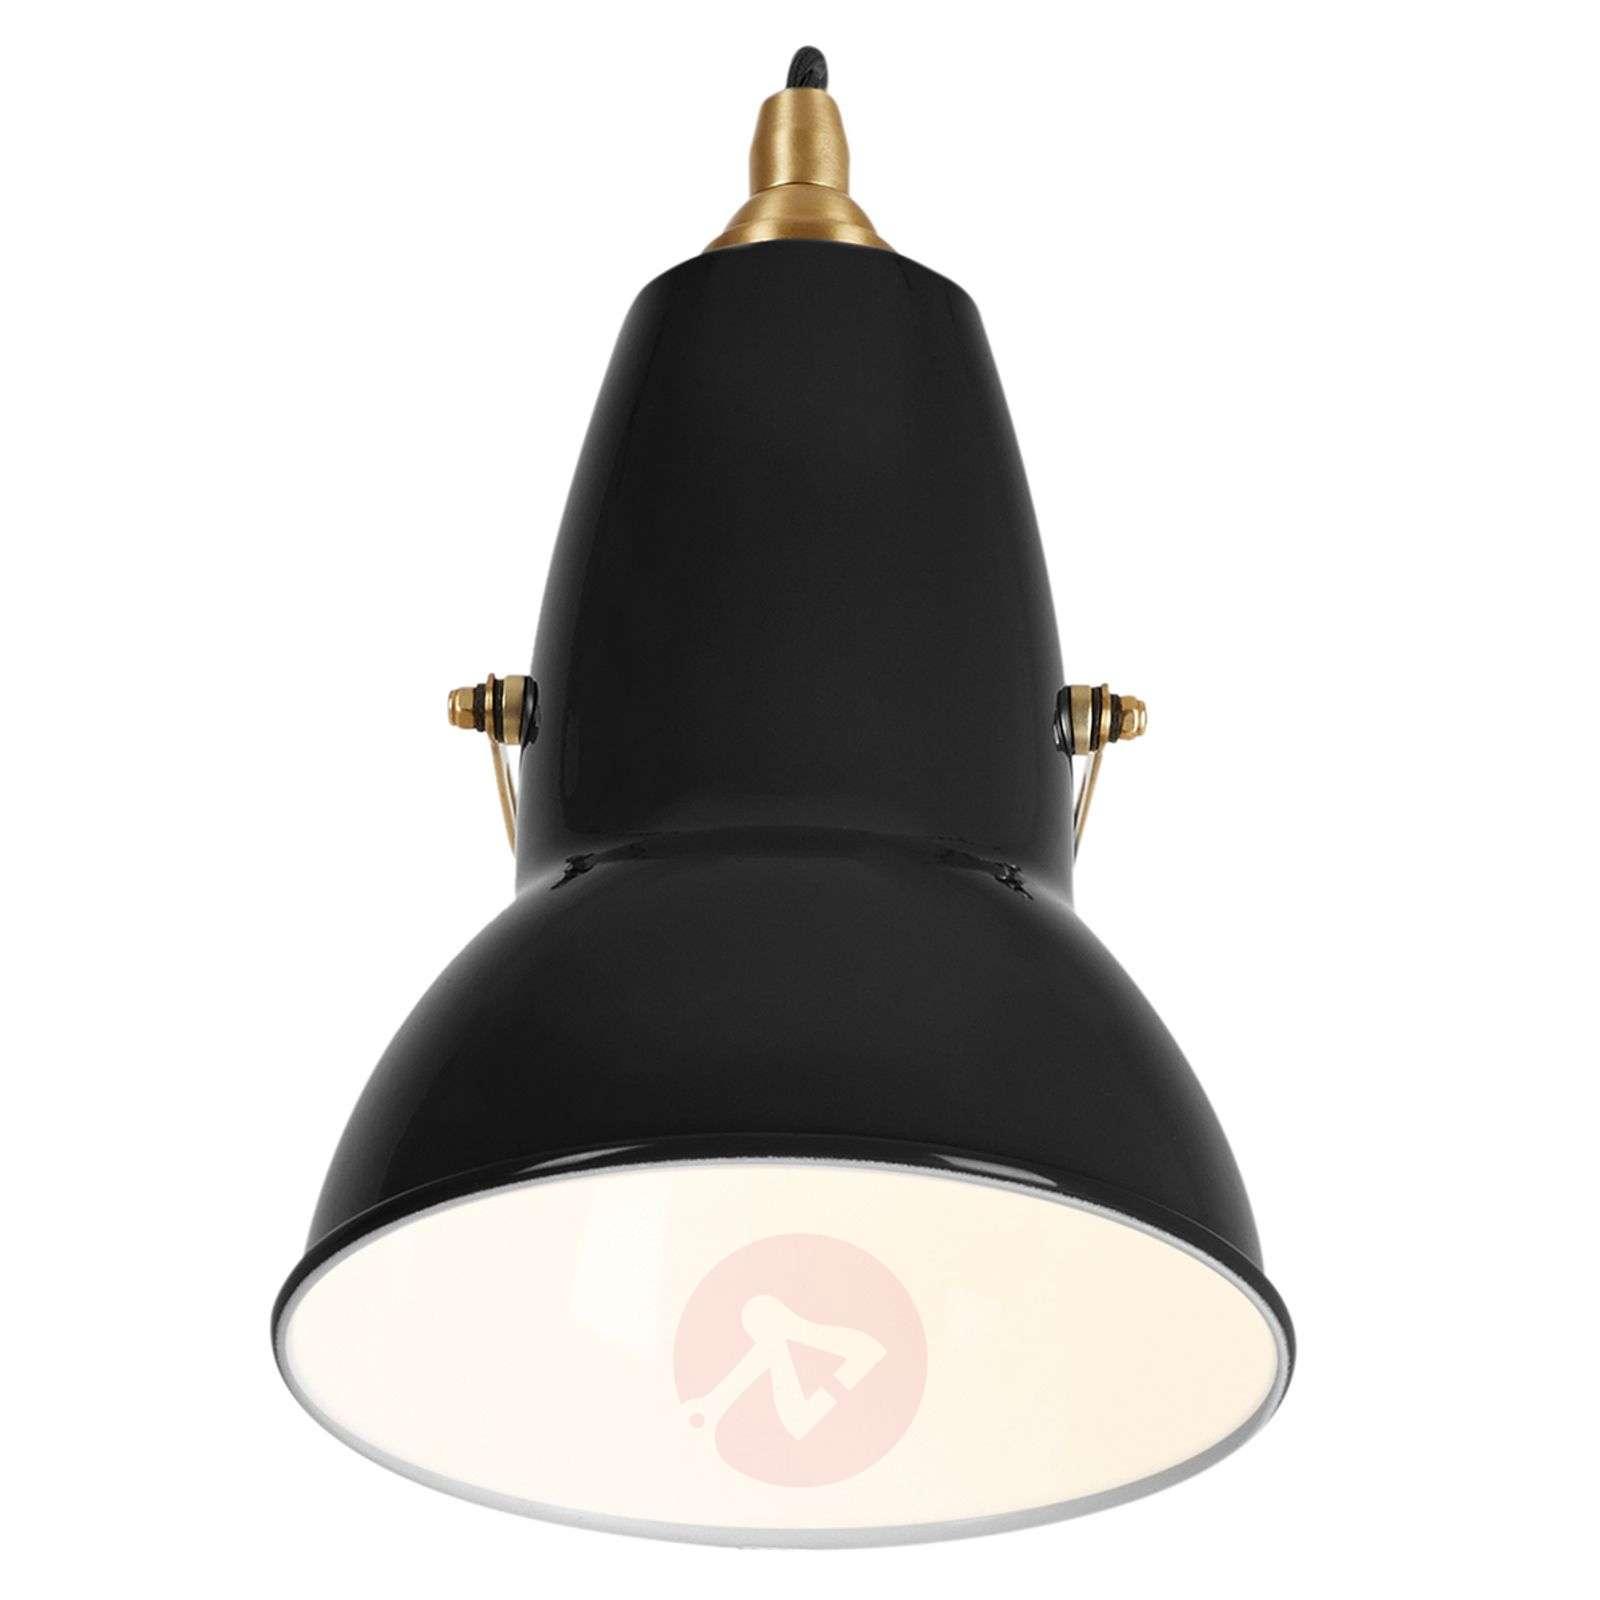 Anglepoise Original 1227 brass wall lamp-1073096X-01